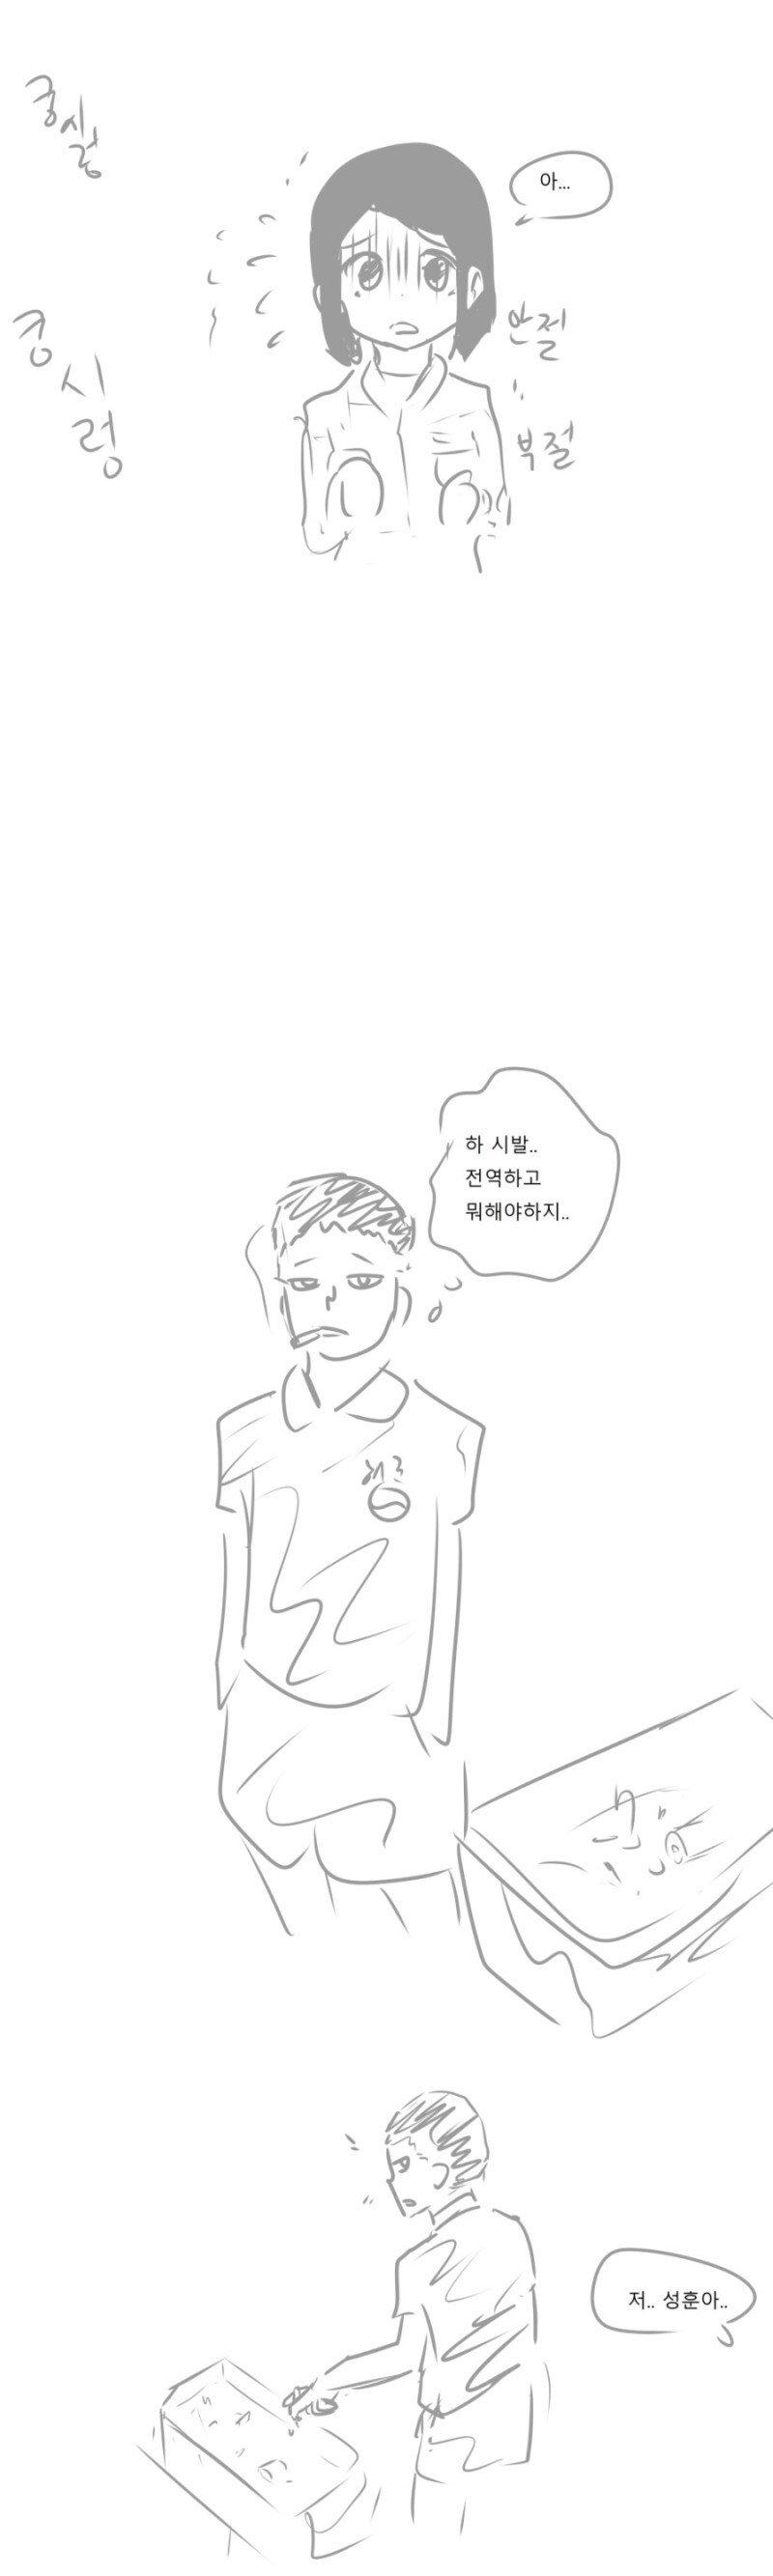 5.jpg 신임소대장이 커여운 여군인.Manhwa